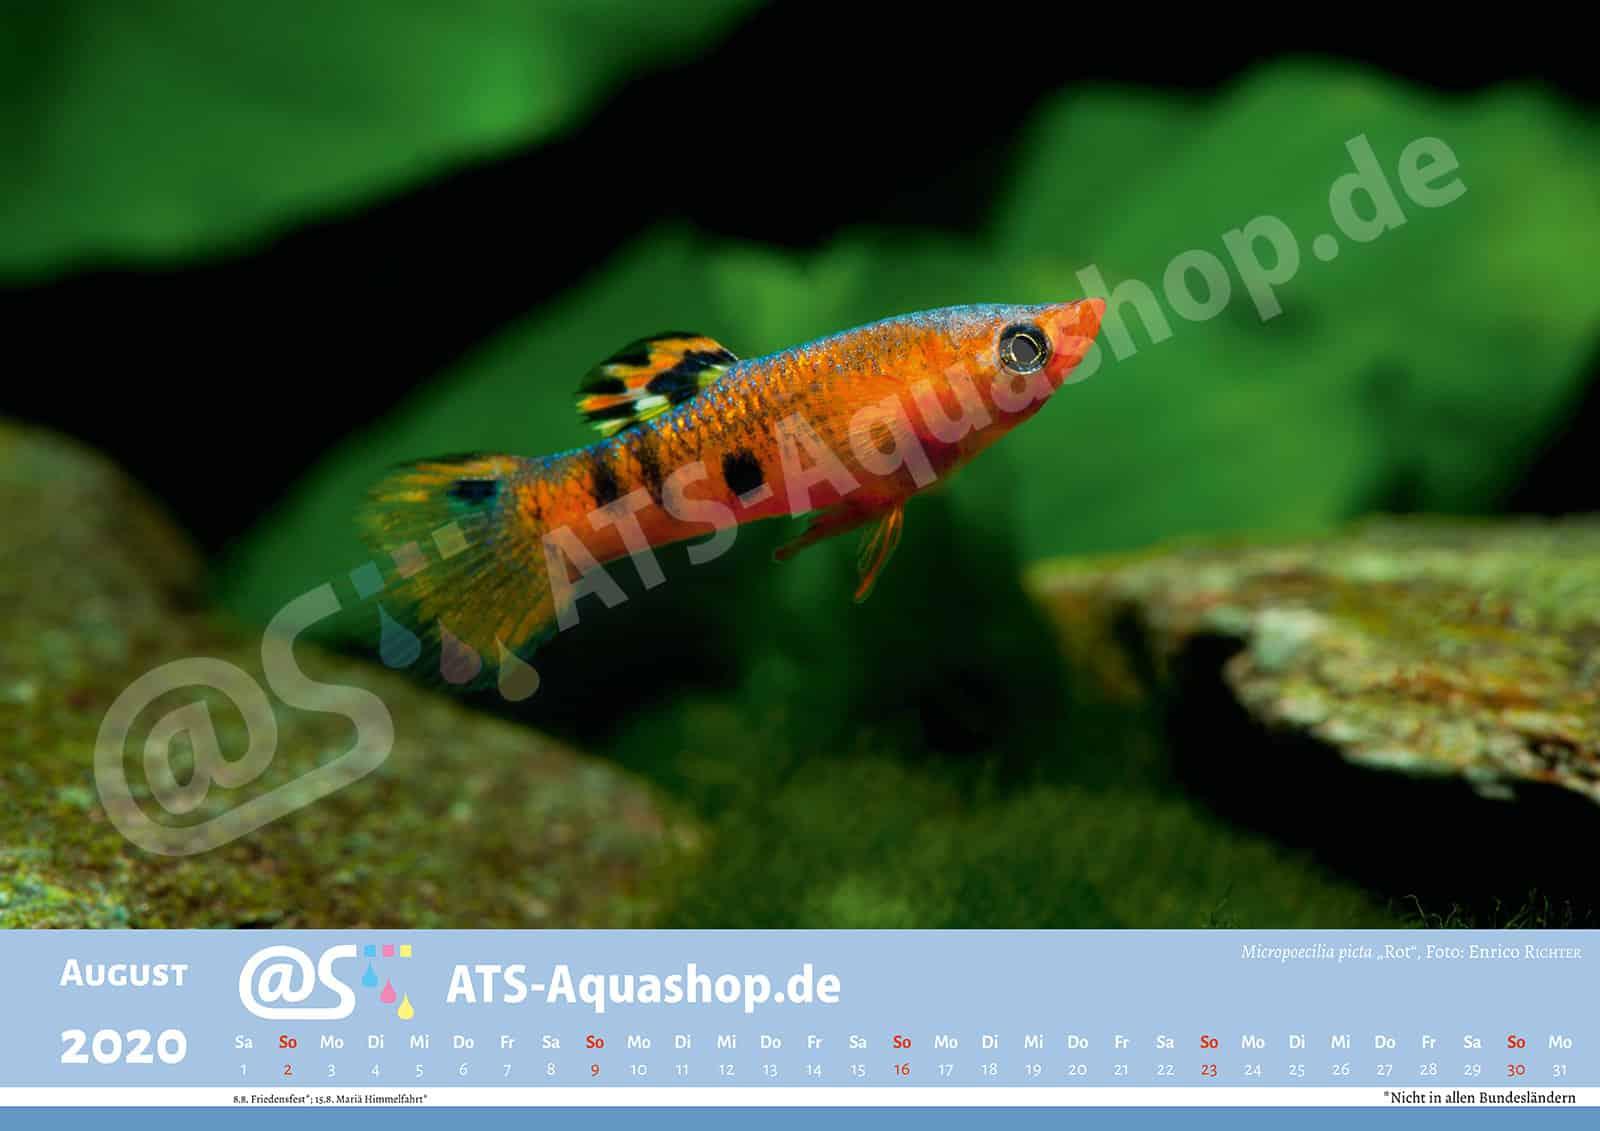 "Foto Jahreskalender 2020 DIN A3: Micropoecilia picta ""Rot"""